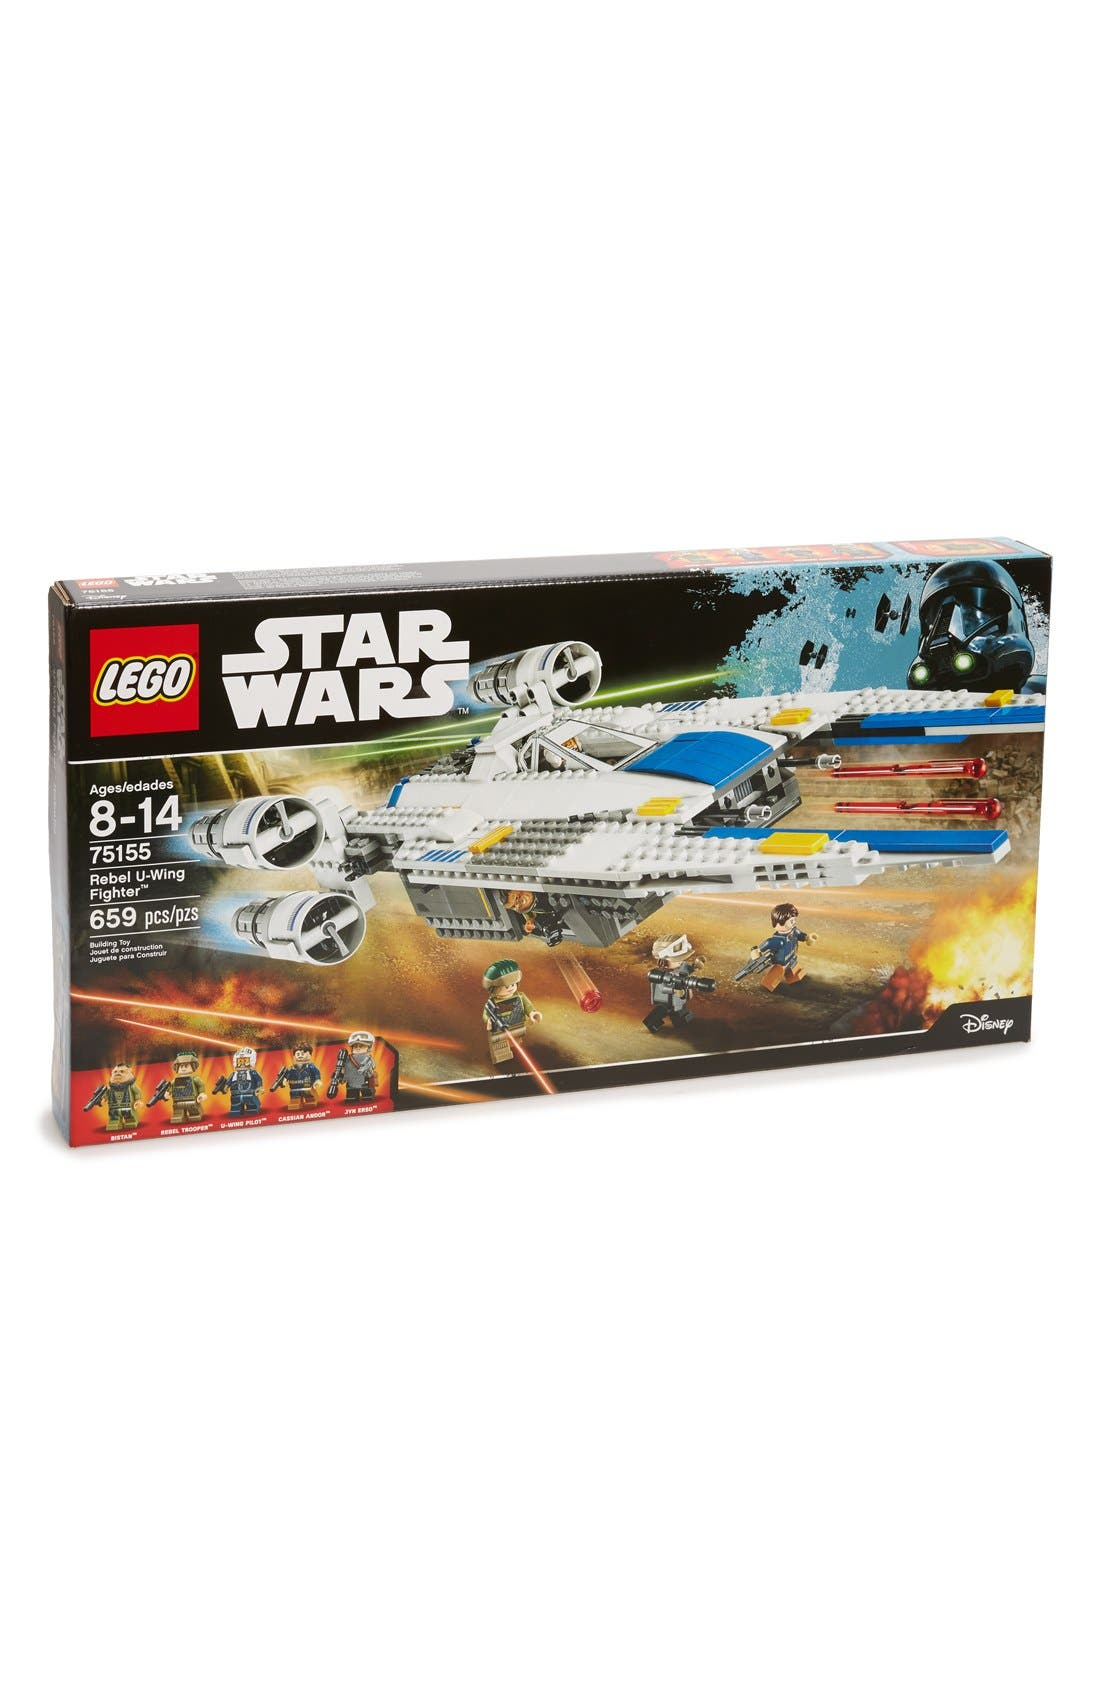 Star Wars<sup>™</sup> Rebel U-Wing Fighter<sup>™</sup> - 75155,                             Main thumbnail 1, color,                             Multi